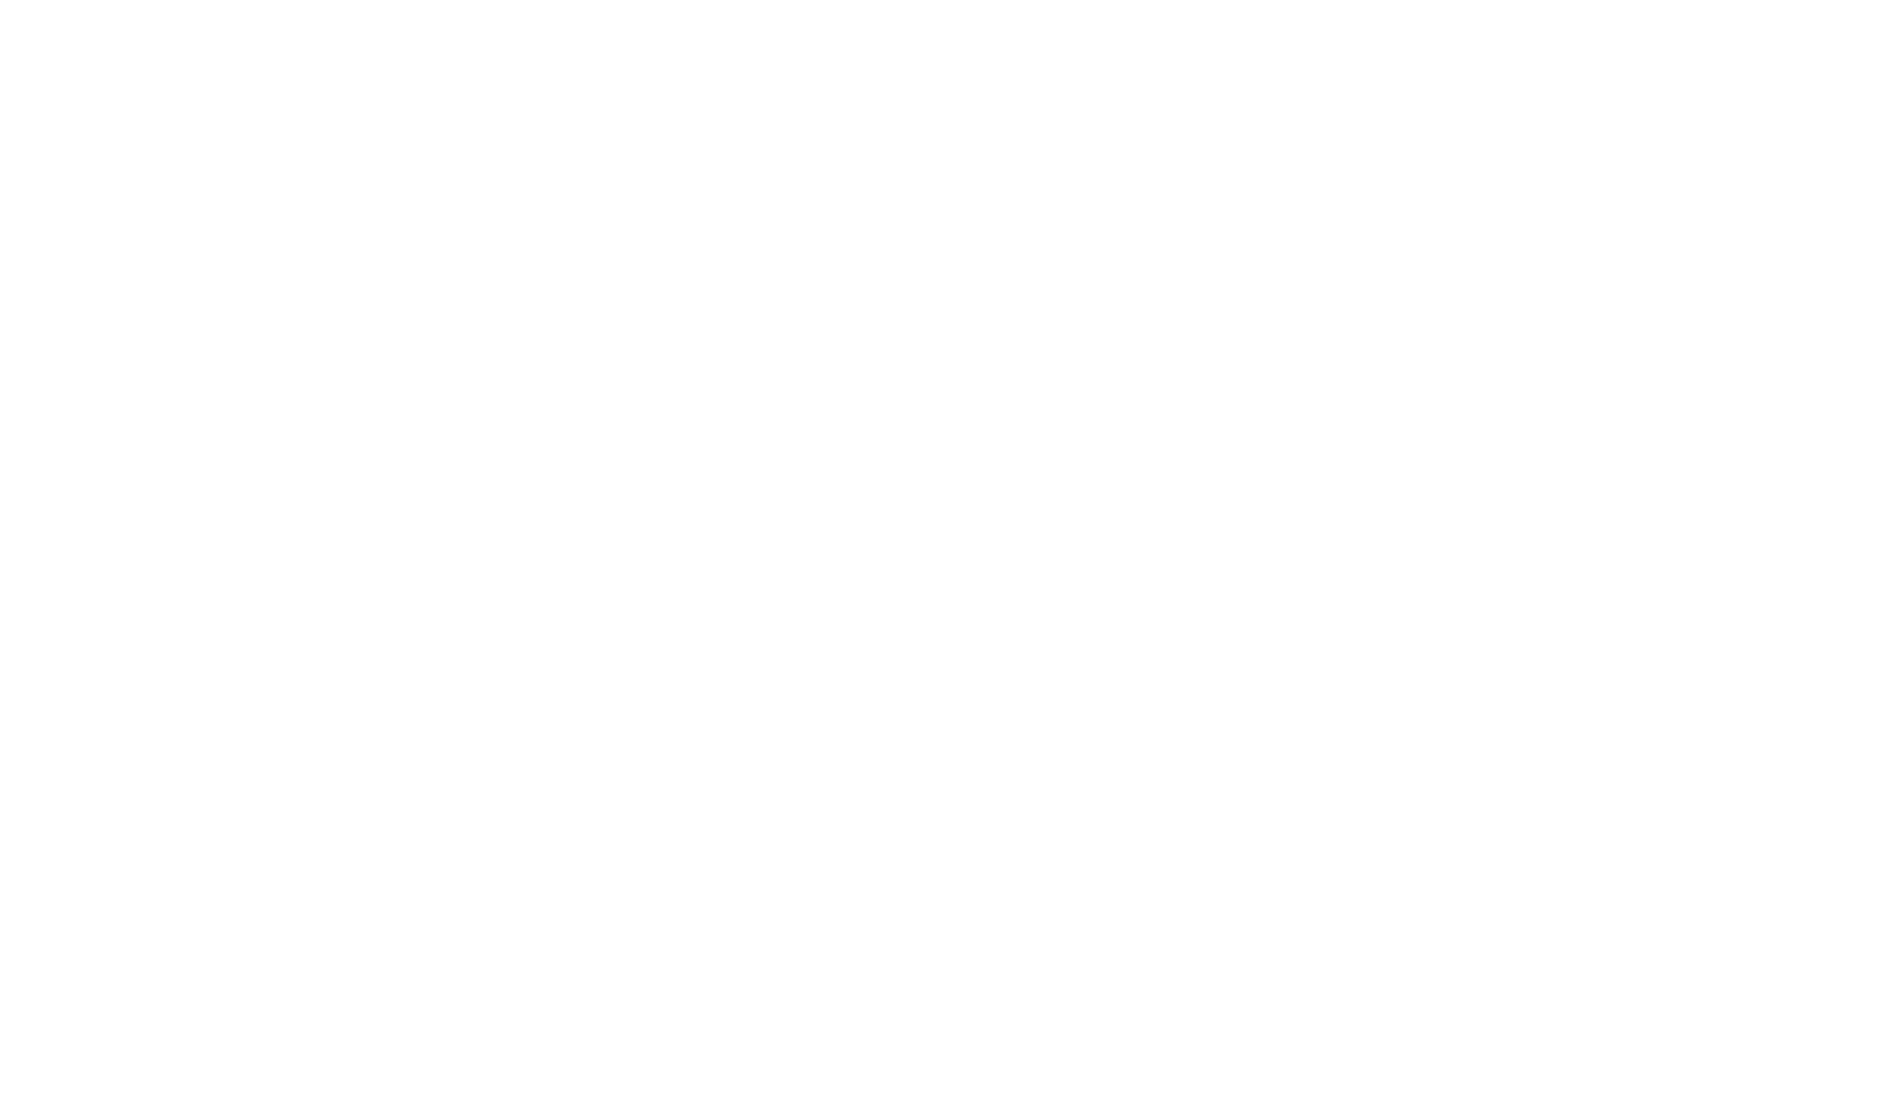 Creativity Performance Coach, Life Coach and Trainer Niddhish Puuzhakkal